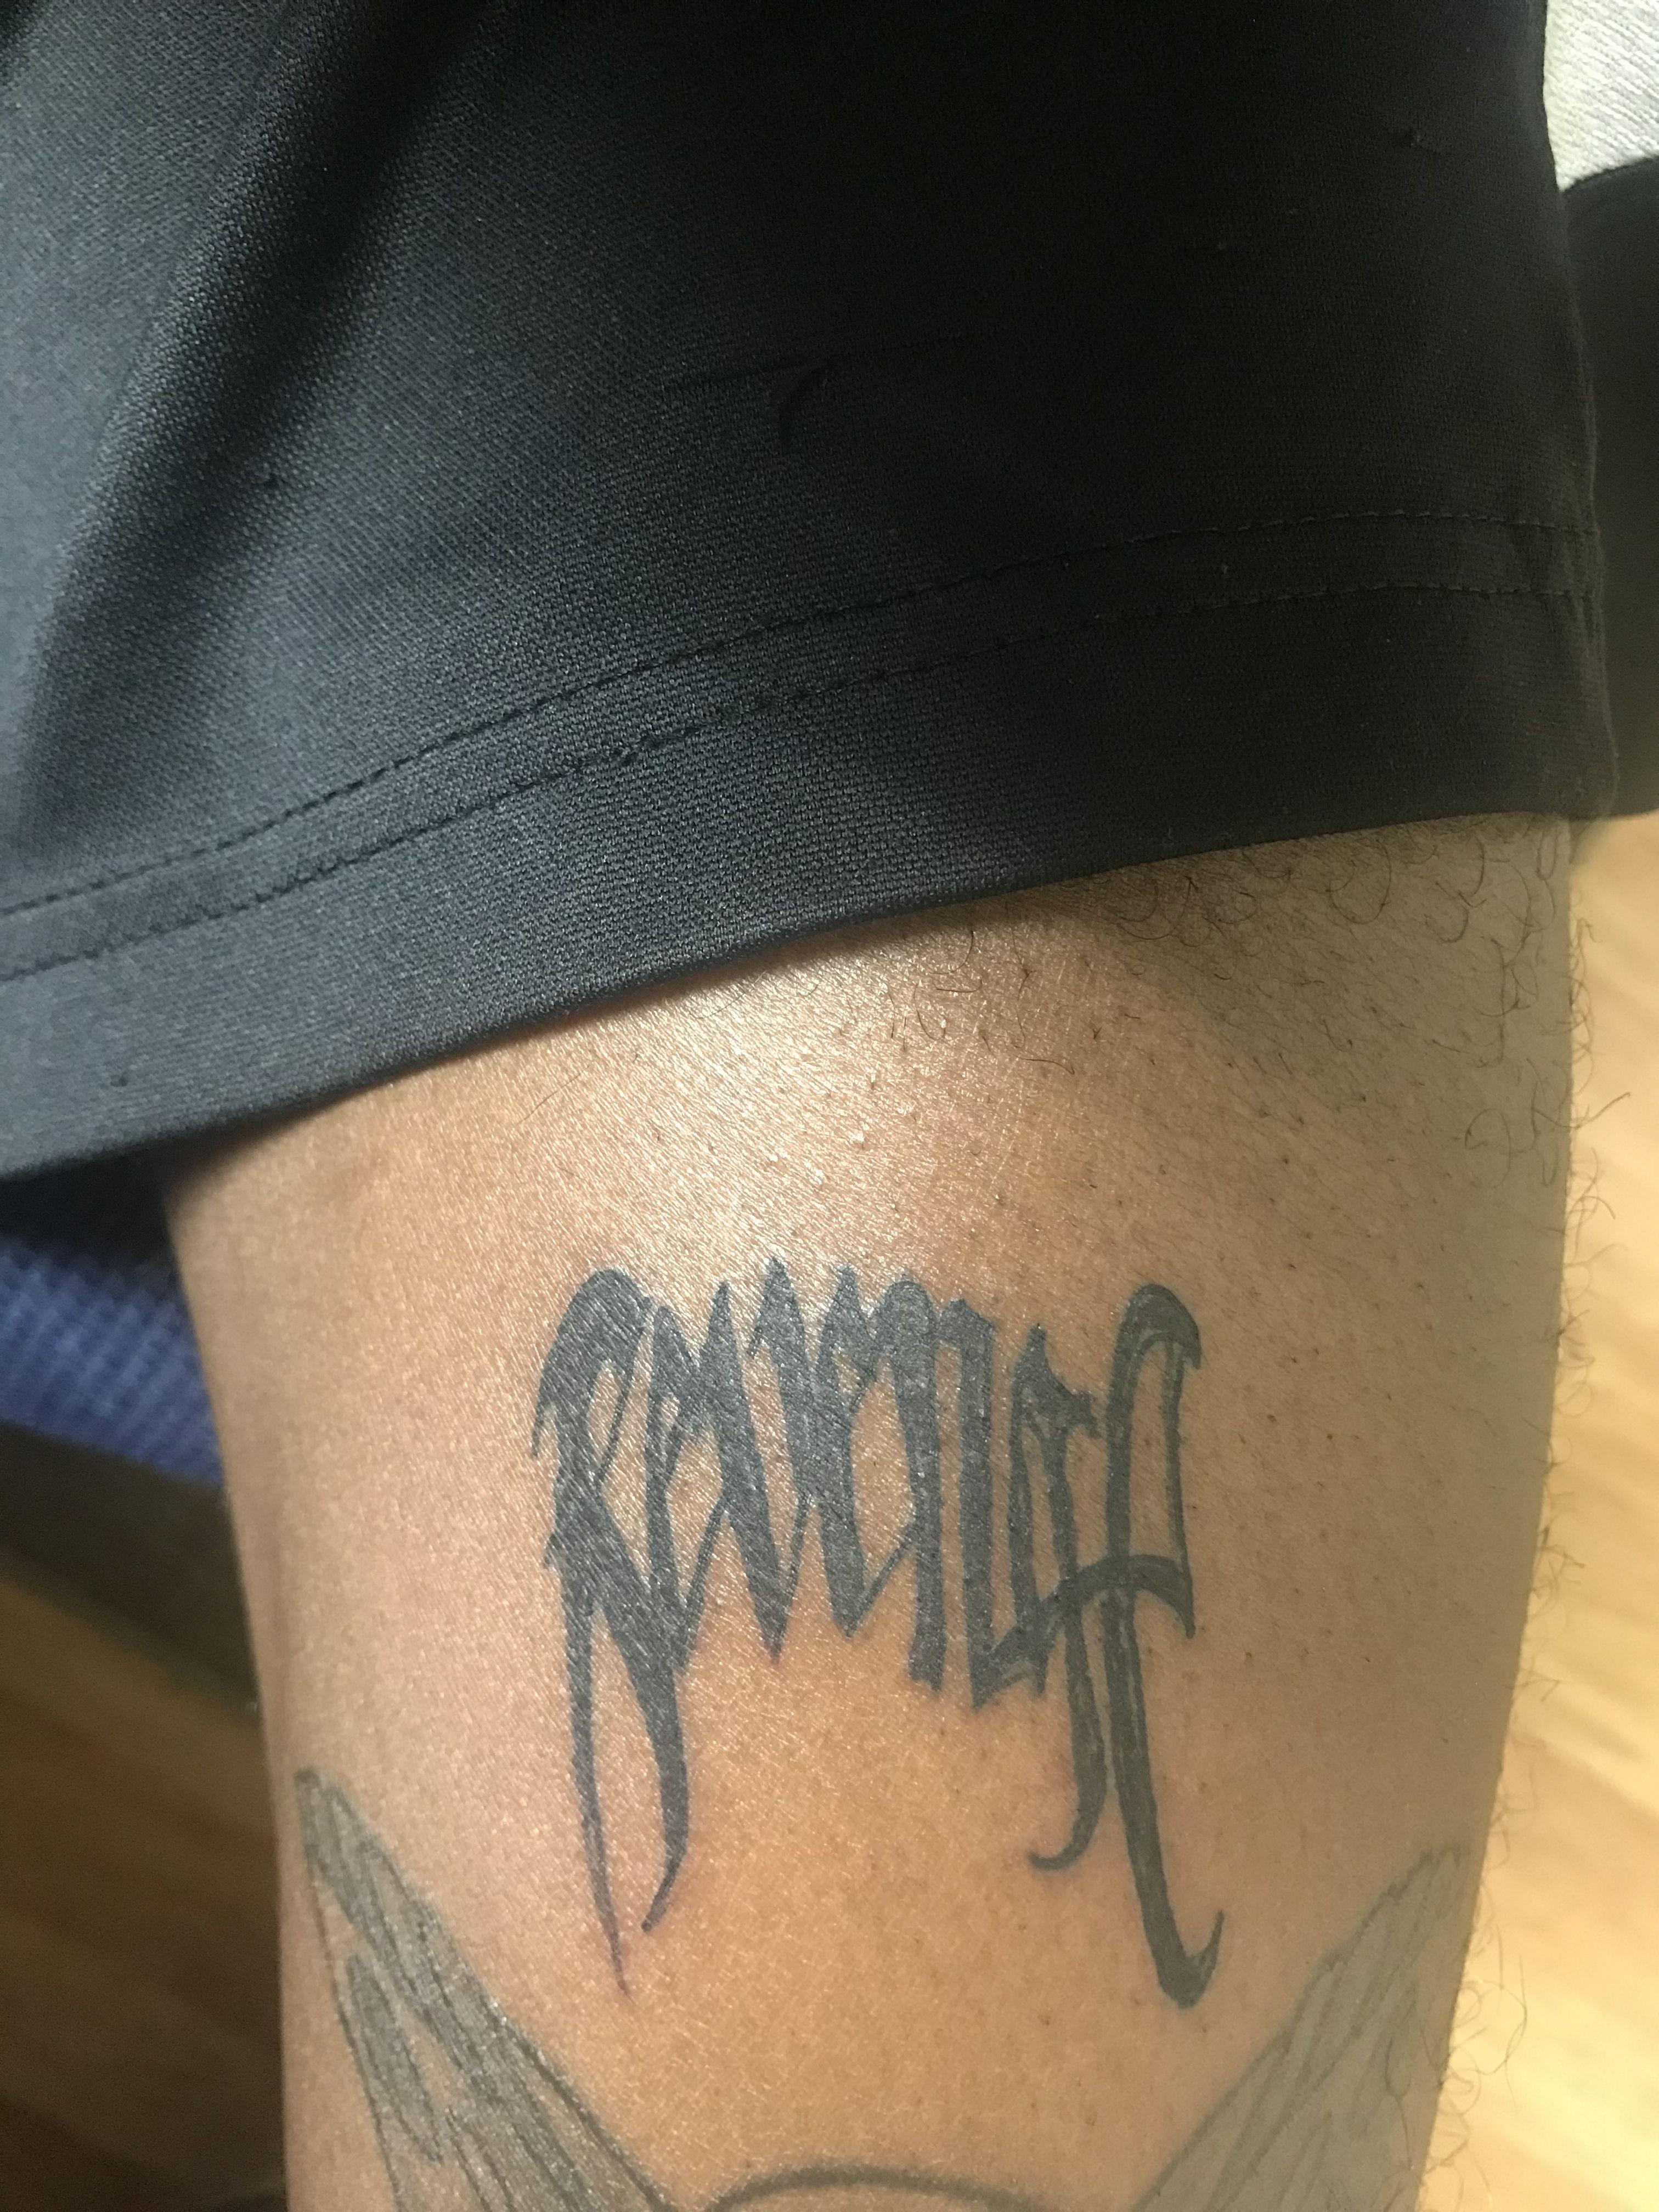 Revenge Tattoo Show : revenge, tattoo, Revenge, Tattoos,, Tattoo, Lettering,, Forearm, Tattoos